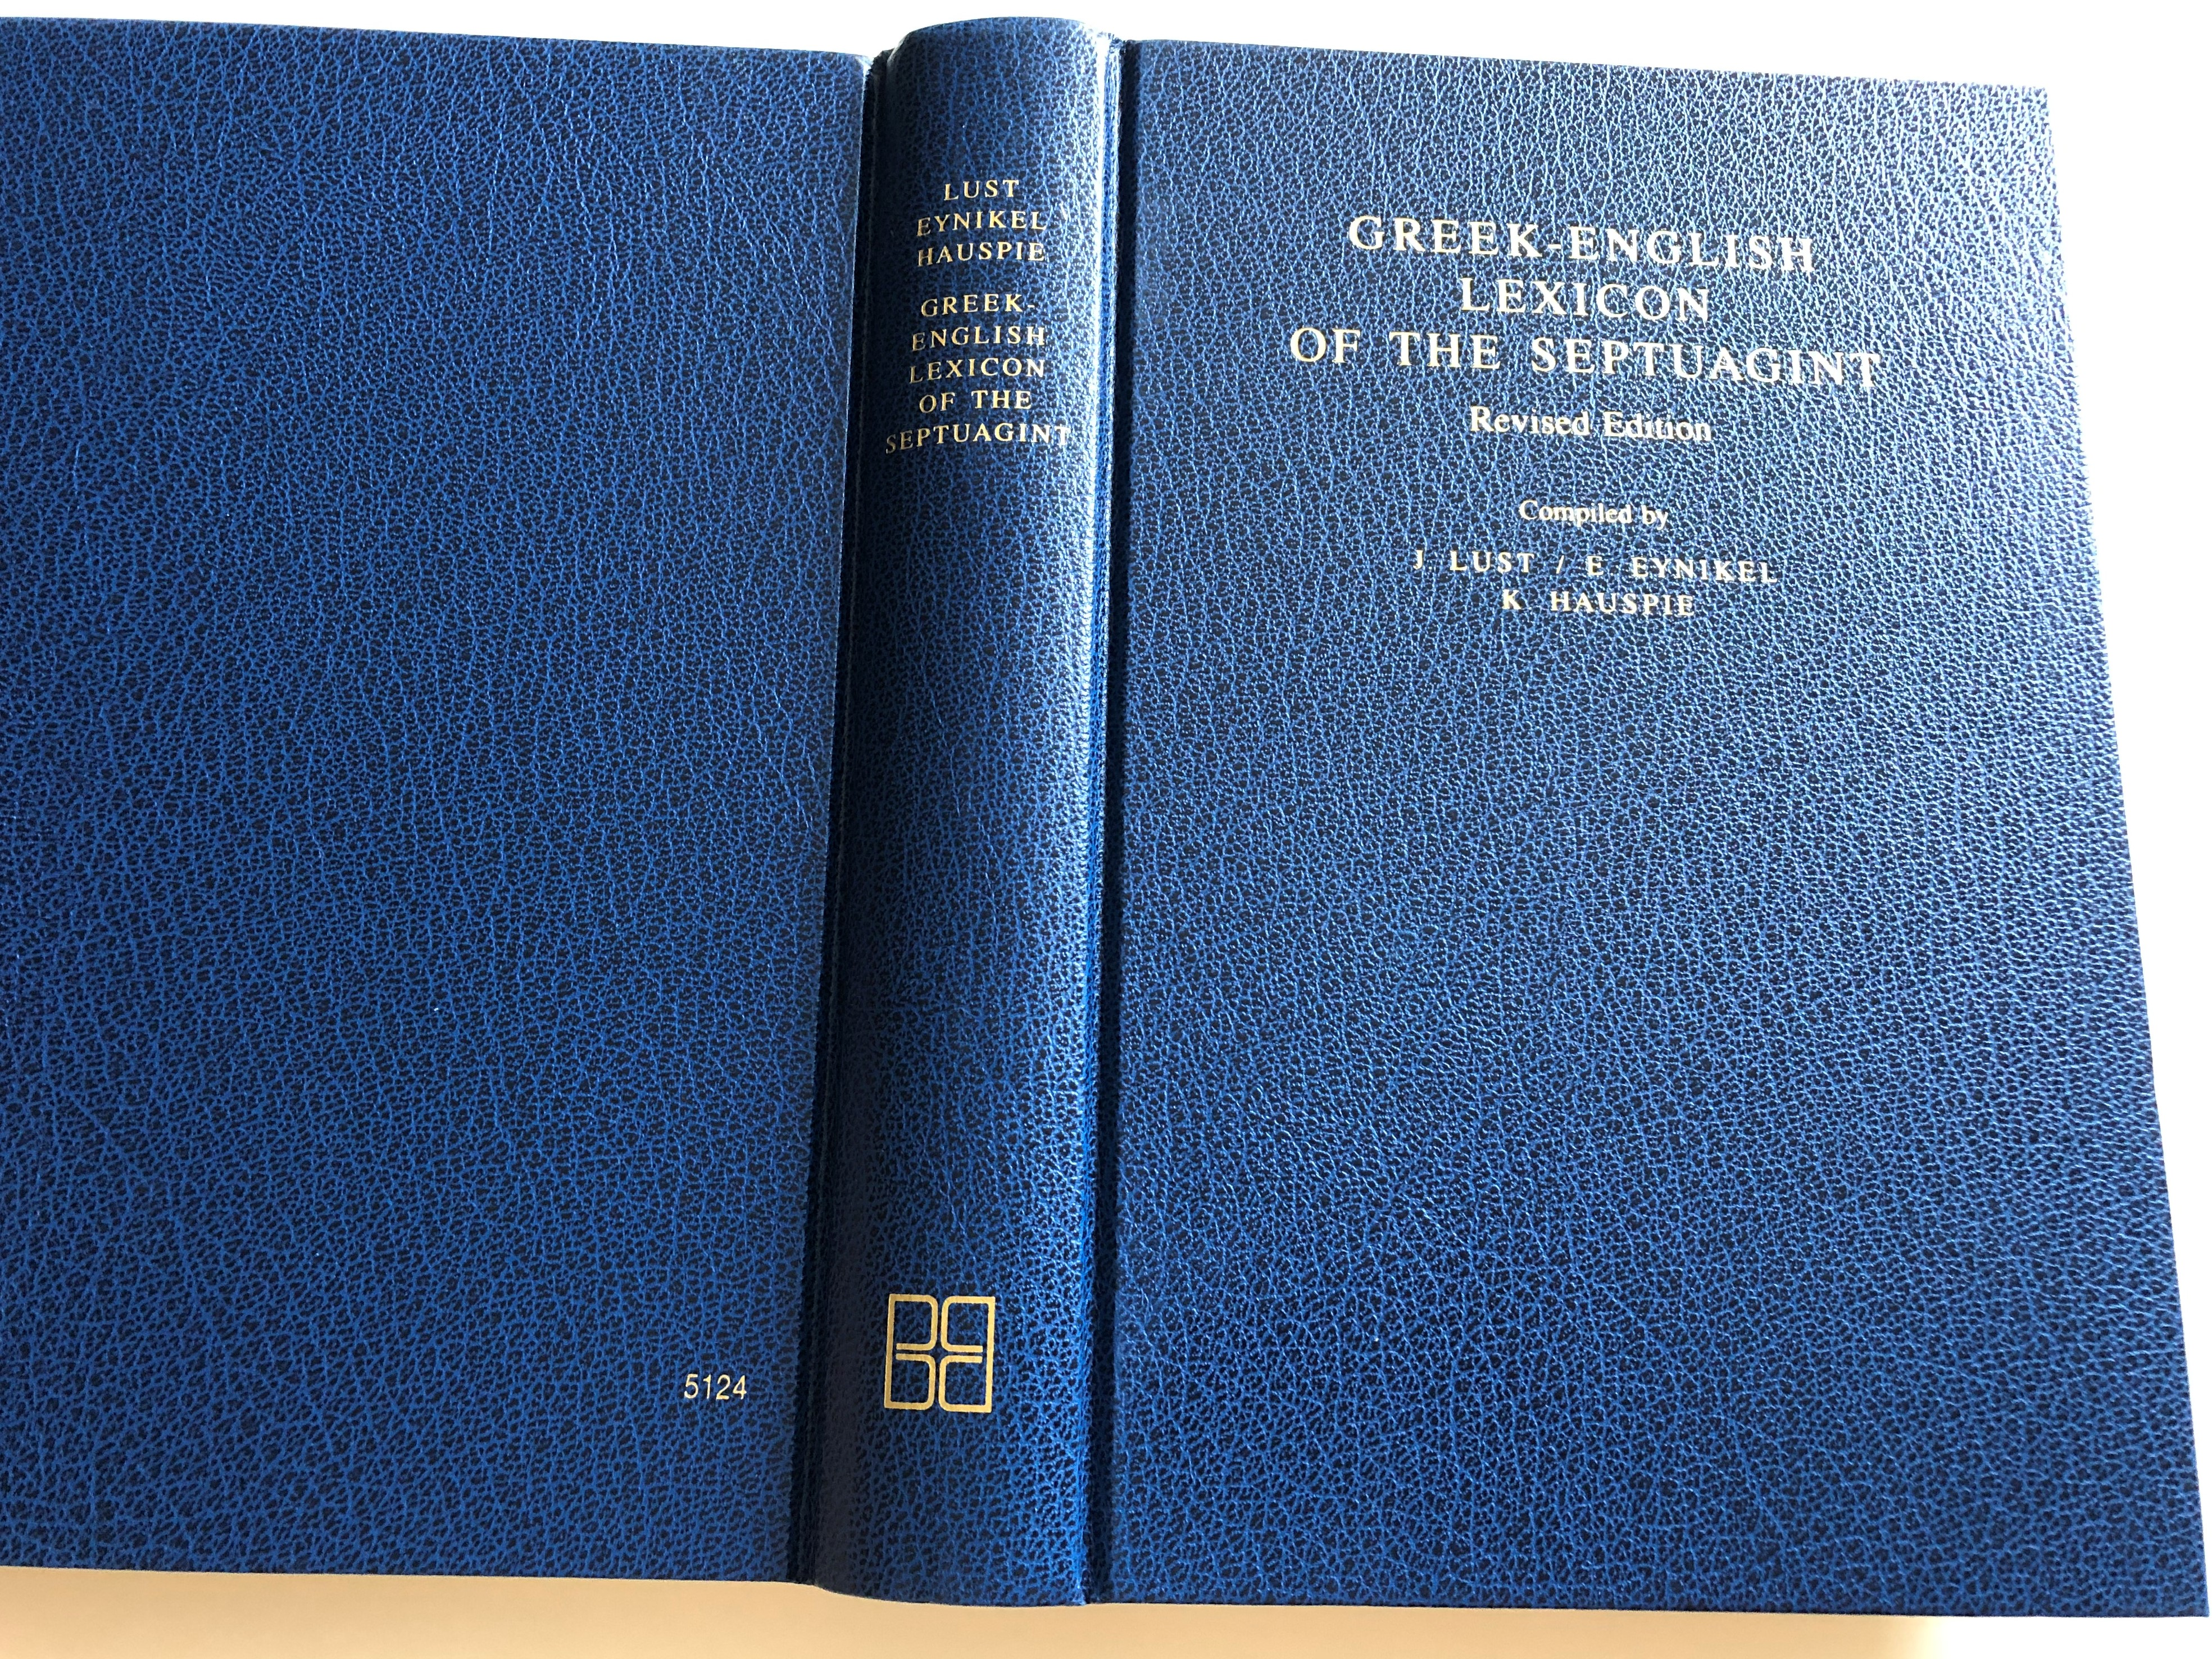 greek-english-lexicon-of-the-septuagint-revised-edition-compiled-by-johan-lust-erik-eynikel-katrin-hauspie-deutsche-bibelgesellschaft-hardcover-2003-22-.jpg